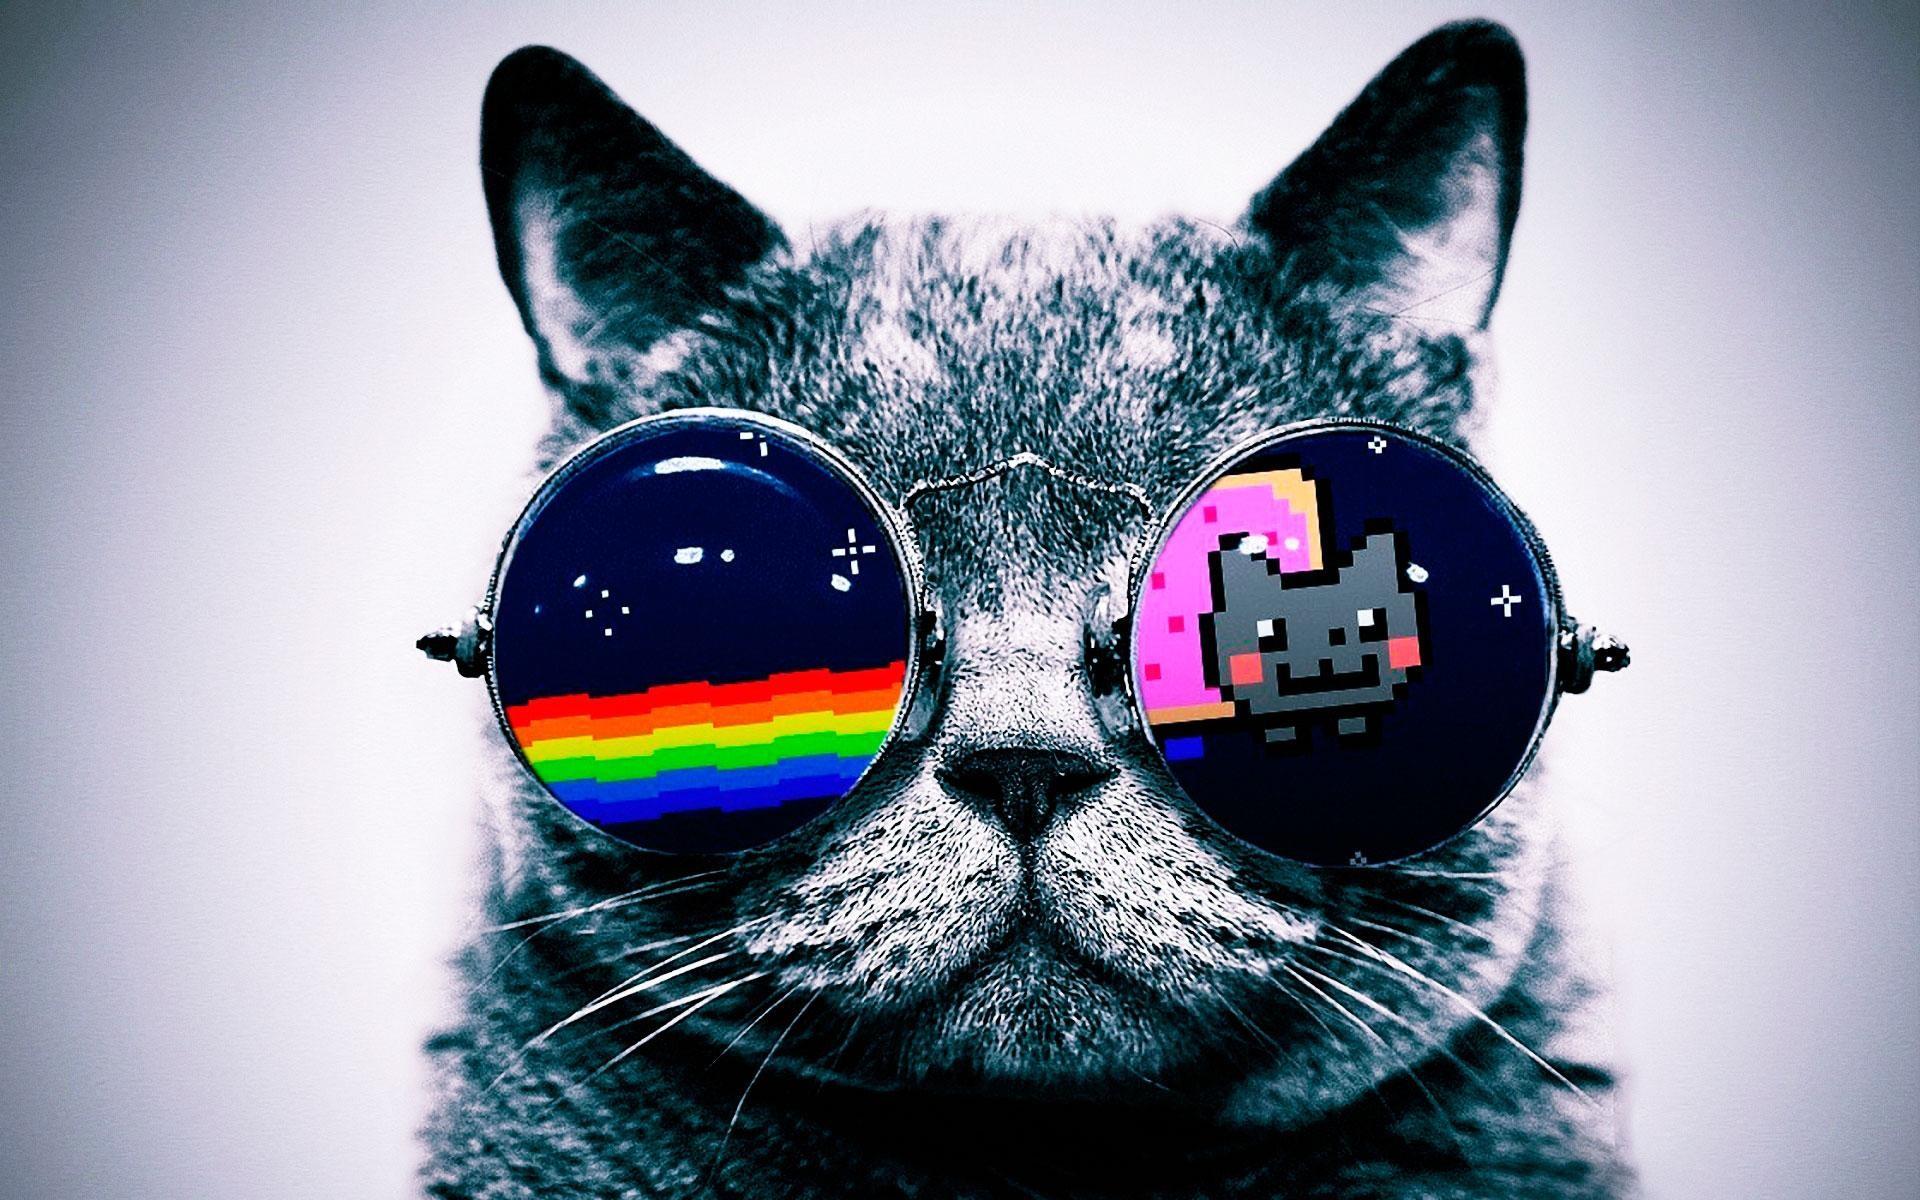 It's A Cool Cat 1920x1200